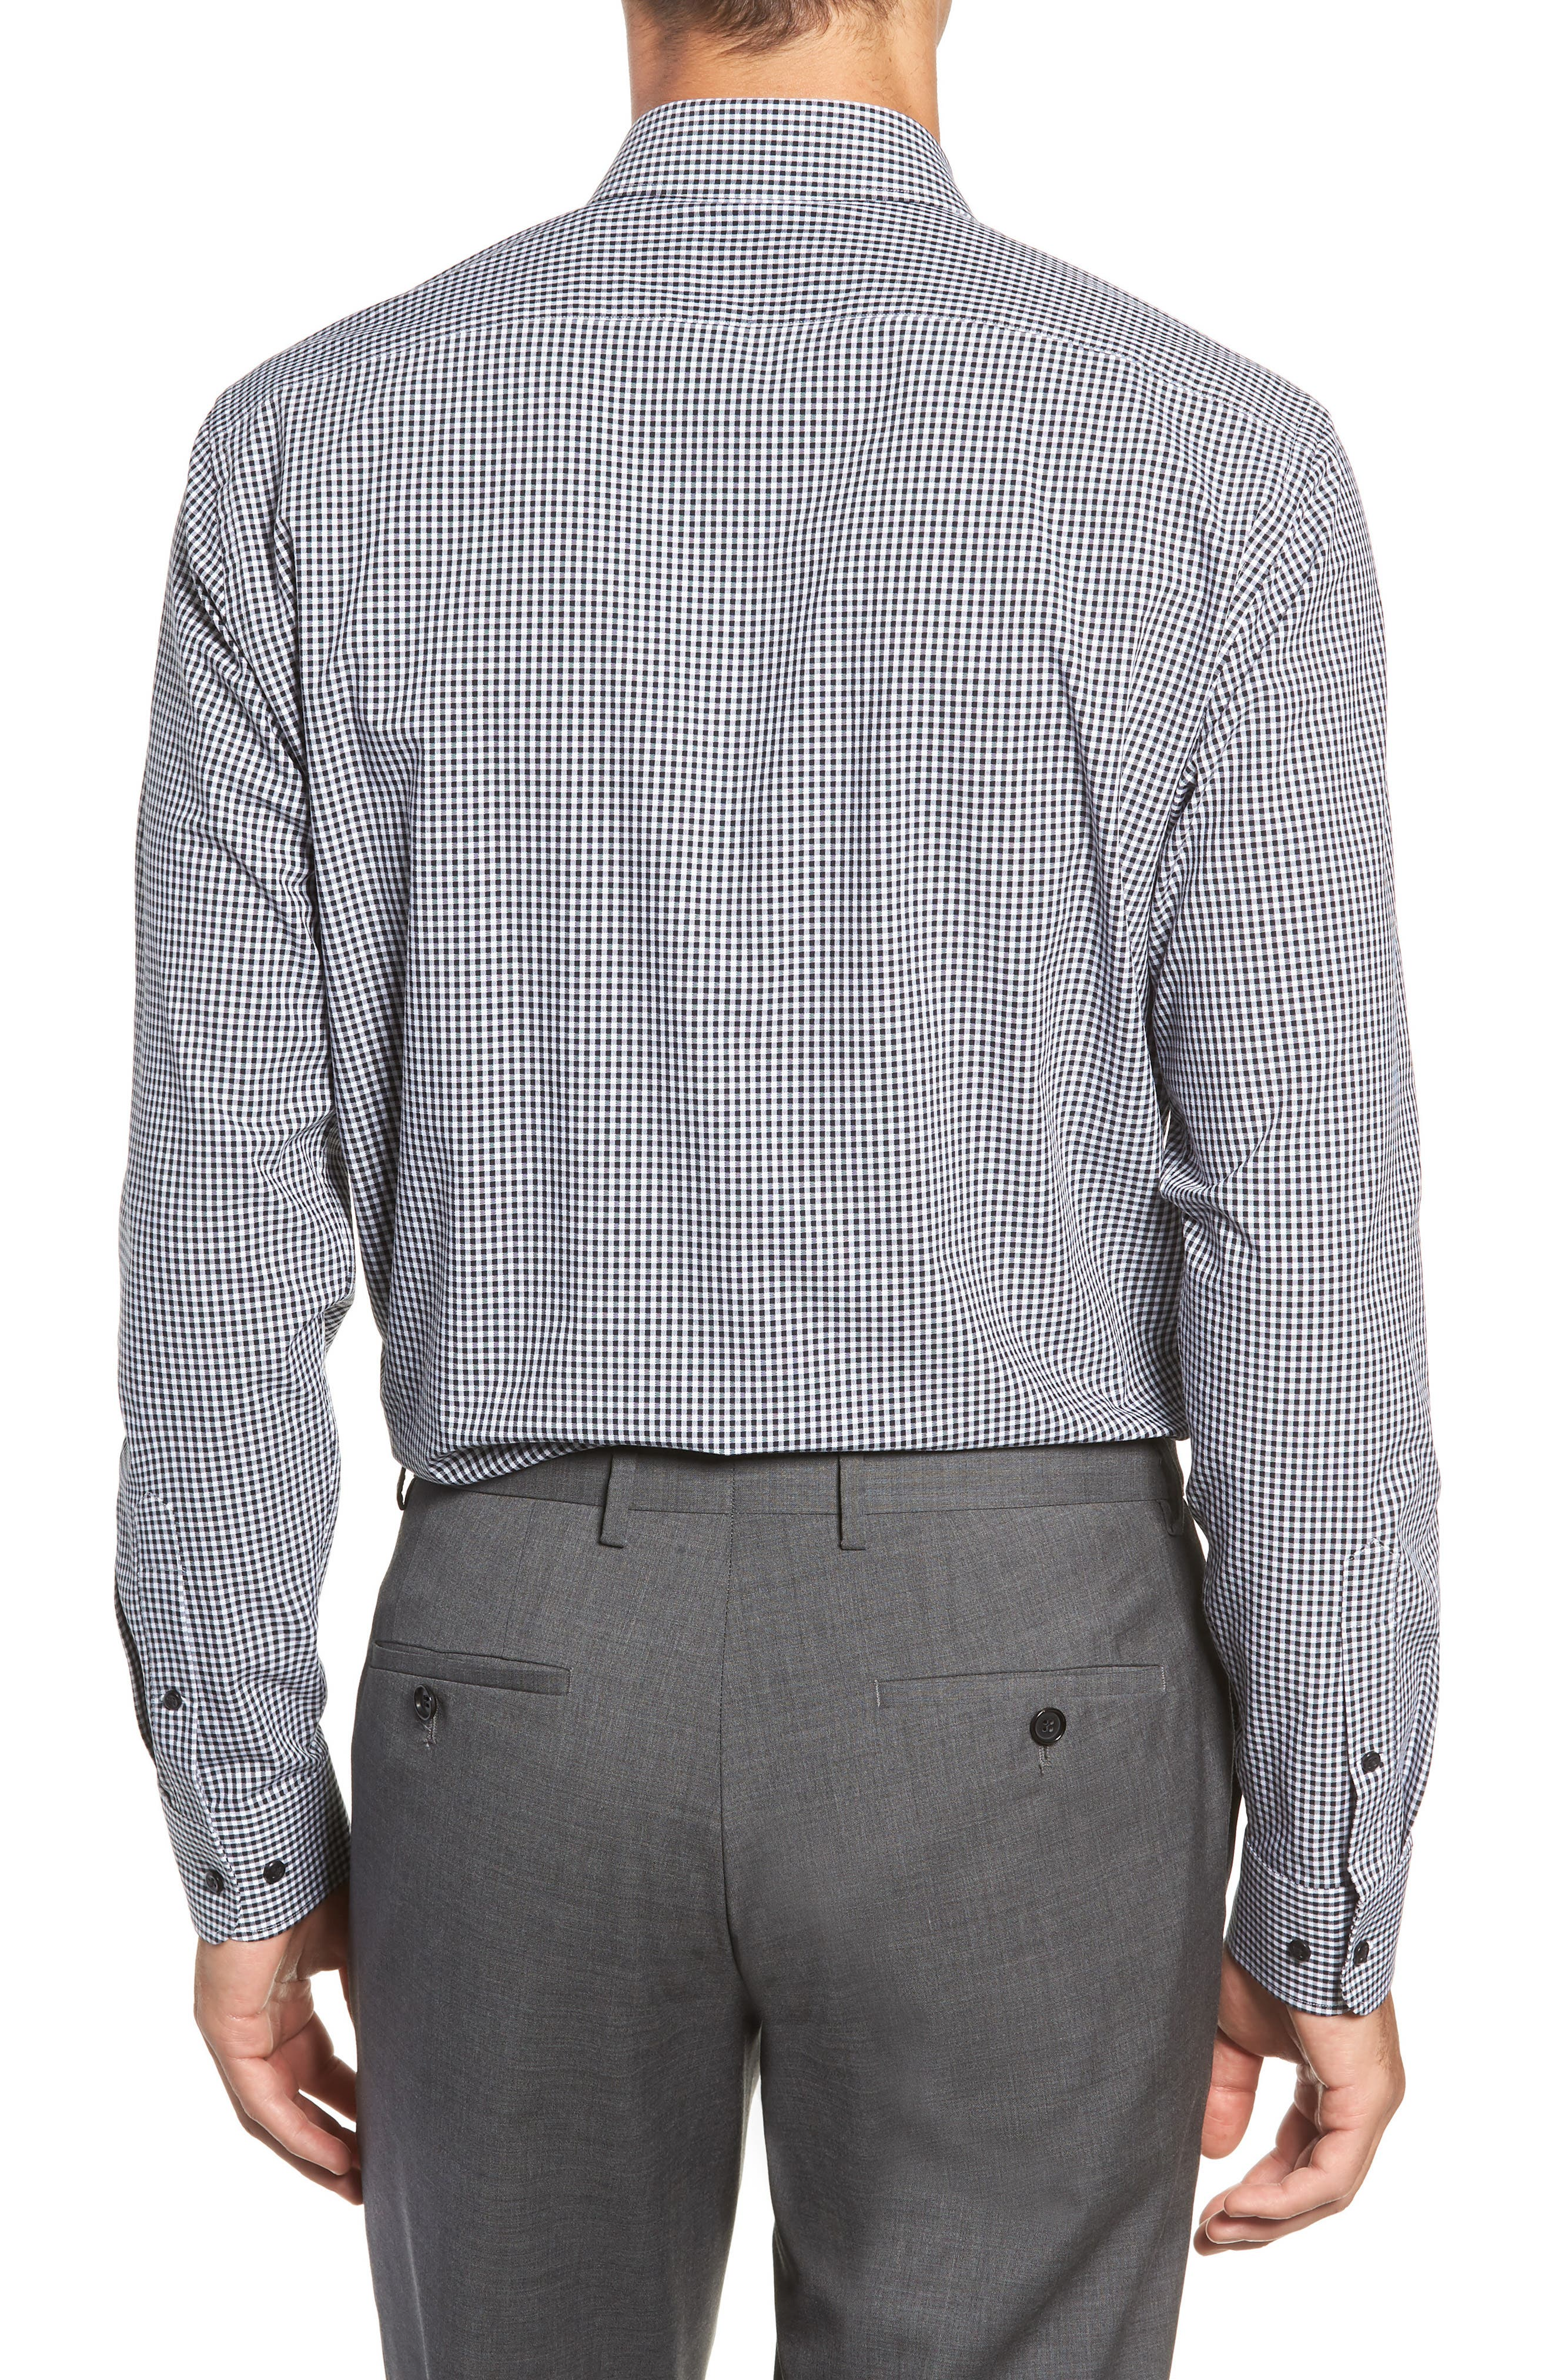 Tech-Smart Trim Fit Stretch Check Dress Shirt,                             Alternate thumbnail 3, color,                             BLACK ROCK